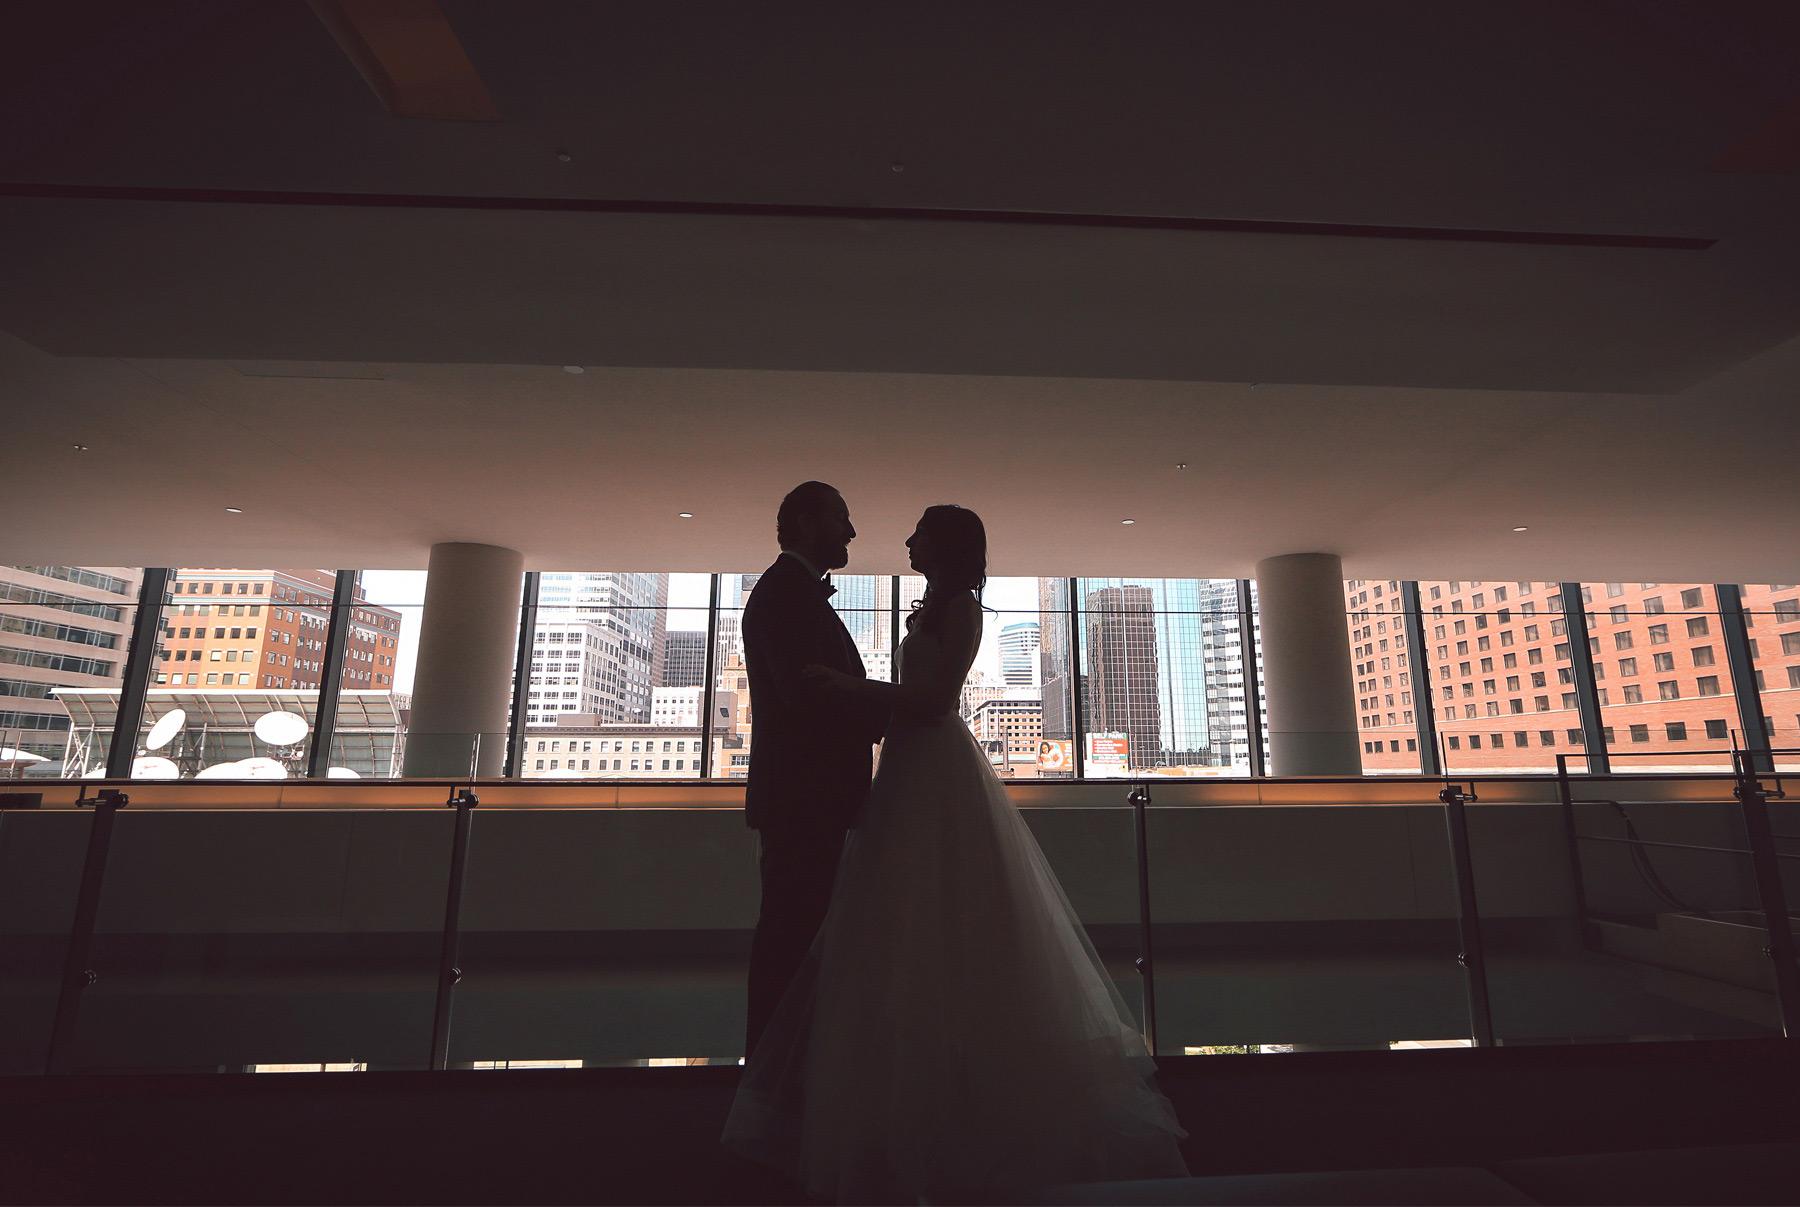 08-Minneapolis-Minnesota-Wedding-Photography-by-Vick-Photography-Hilton-Downtown-Vintage-Lisa-and-Jared.jpg